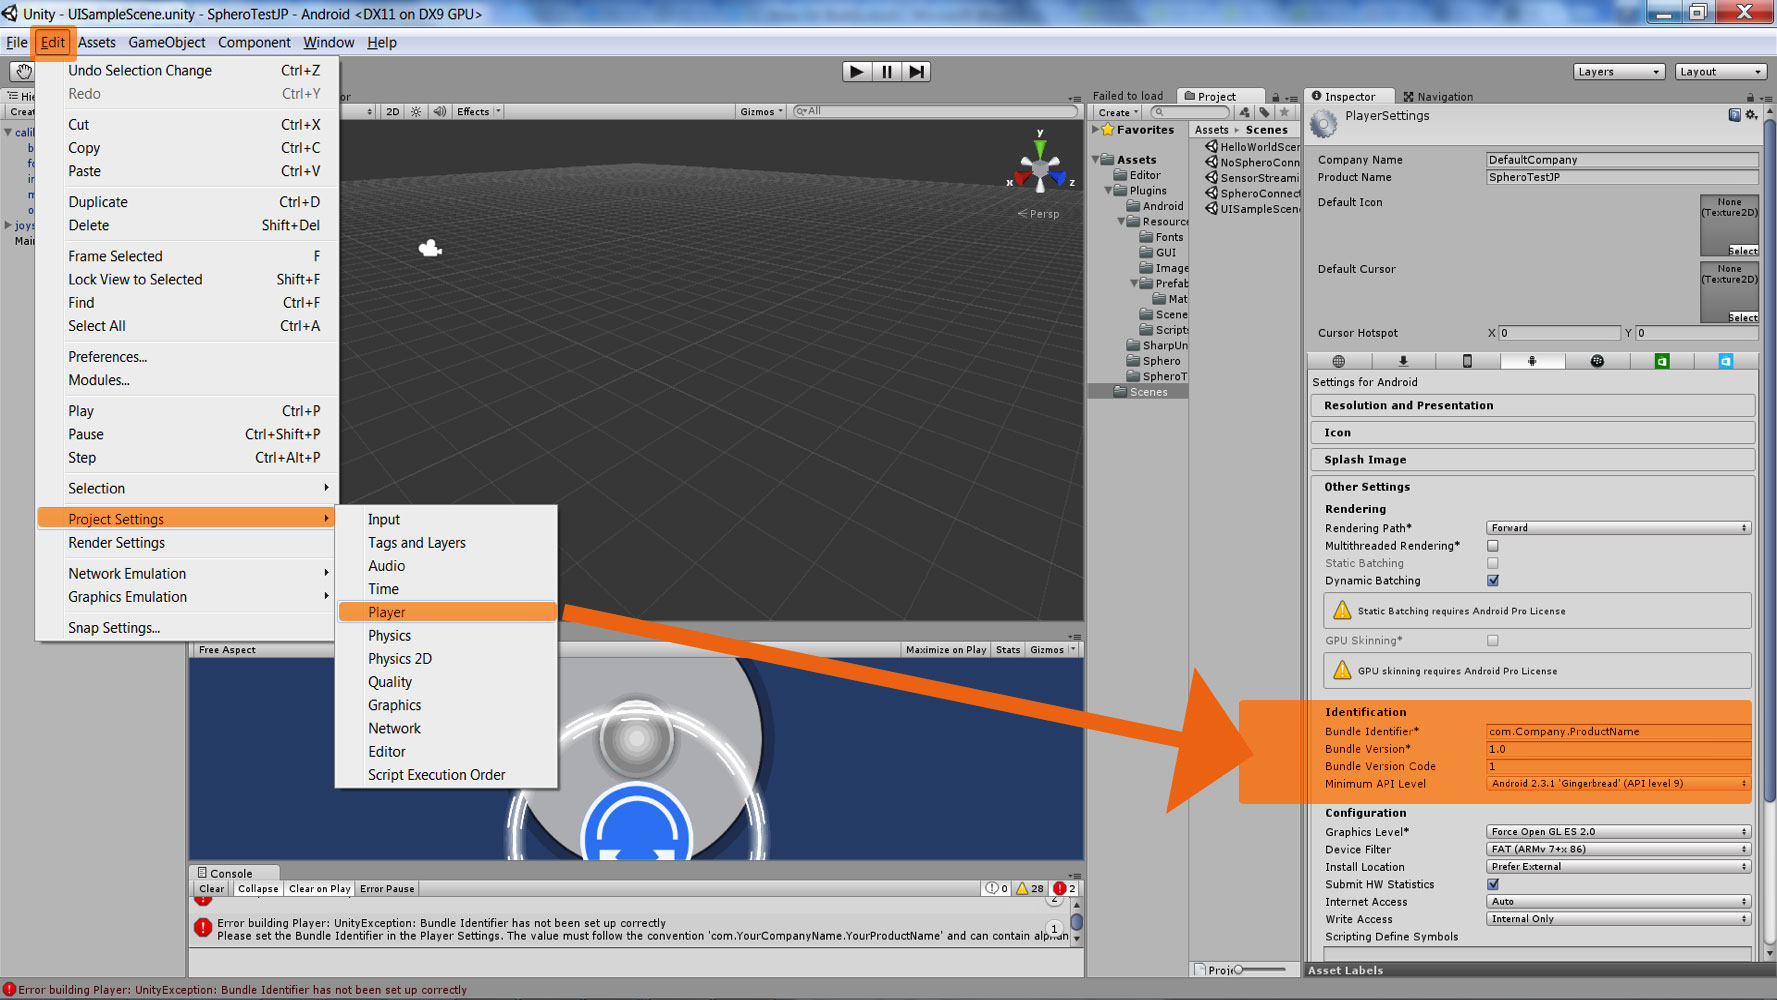 Install a development environment Unity/Android/SDK(Robot